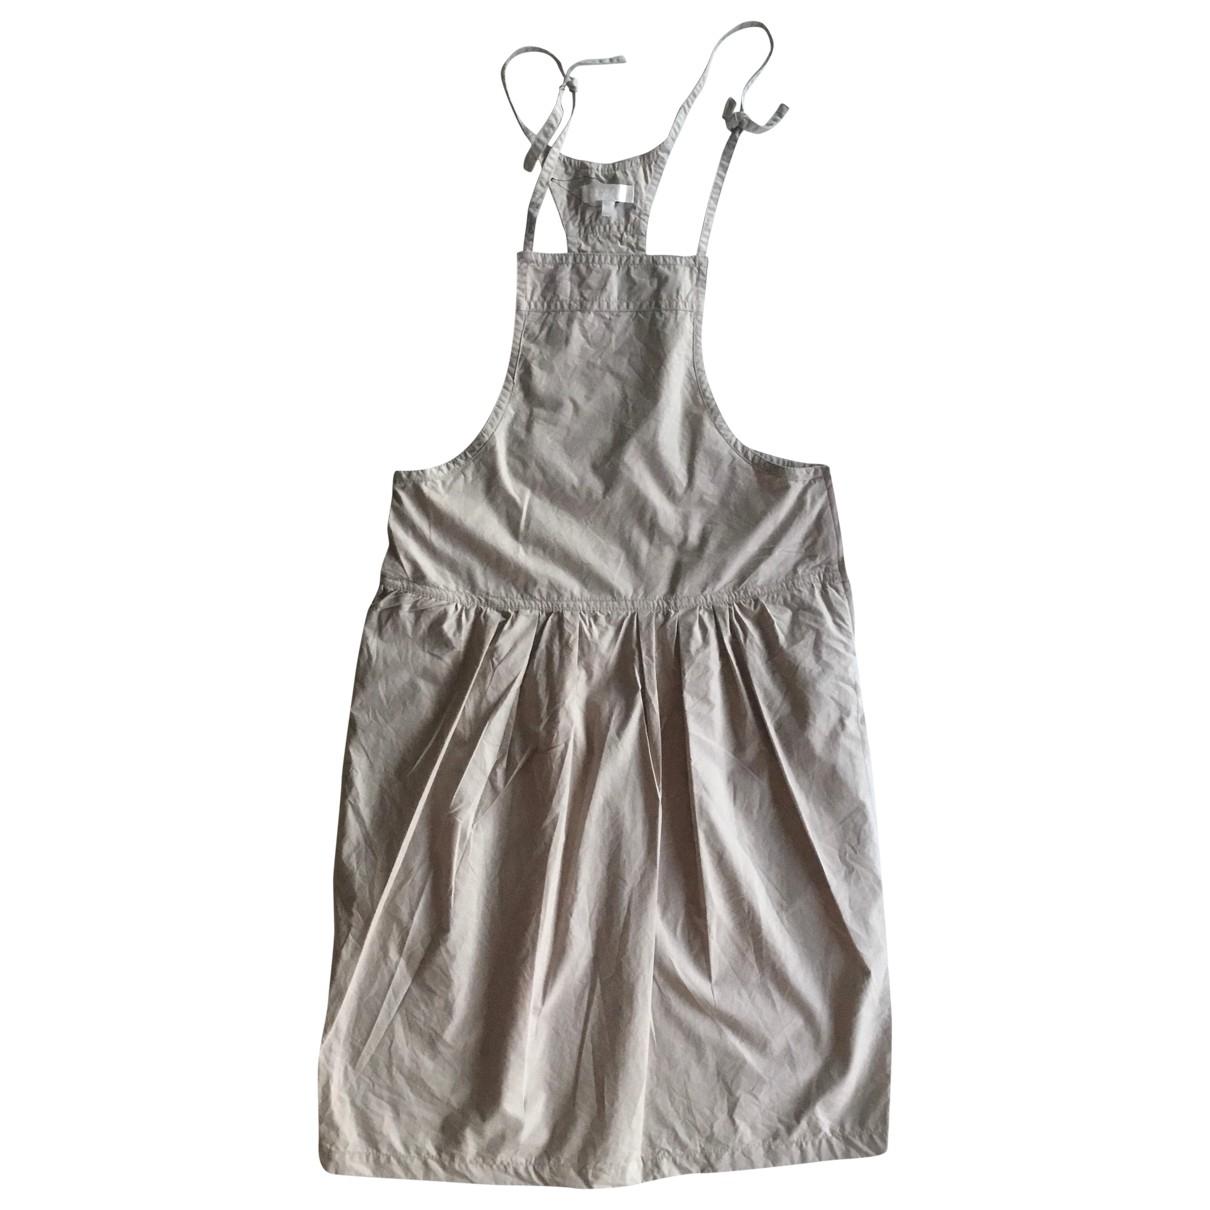 Claudie Pierlot \N Ecru Cotton dress for Women 1 0-5